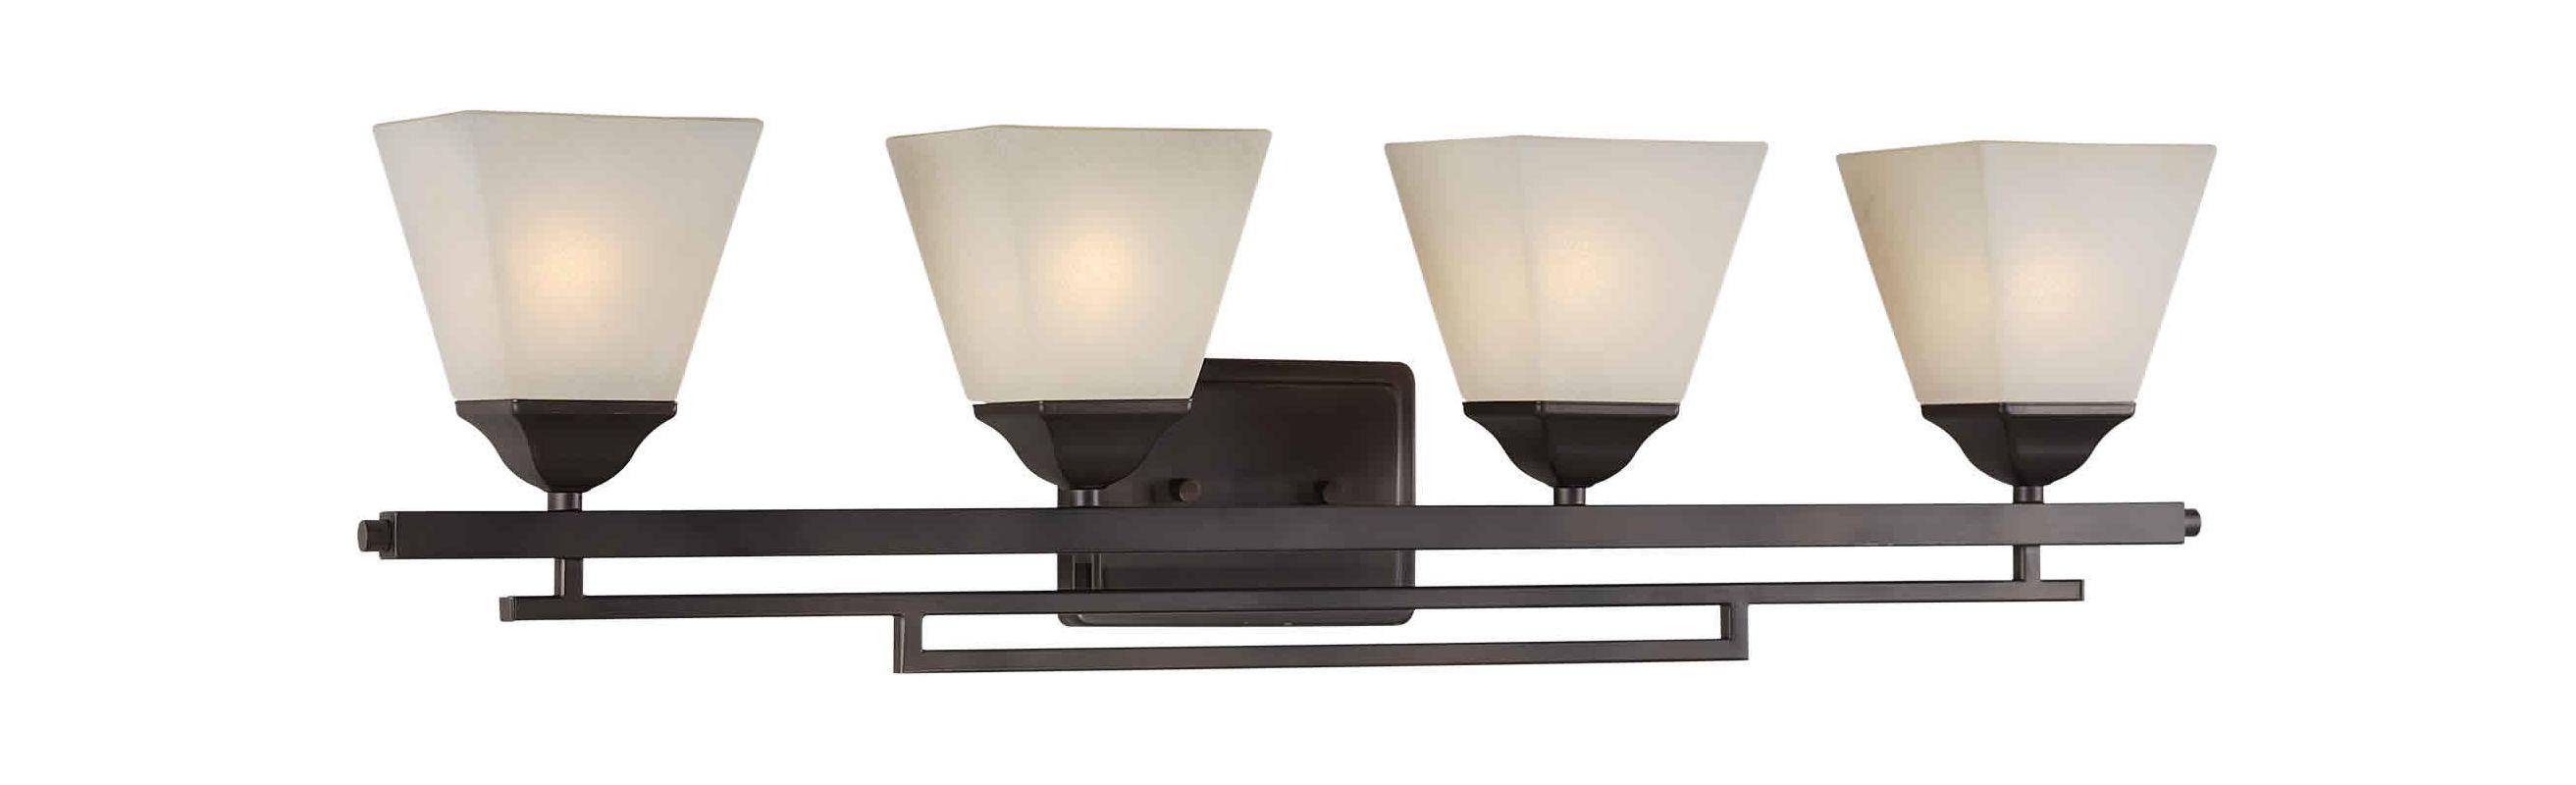 Forte Lighting 5084-04 Contemporary/ Modern 34Wx8.75Hx6E Indoor Up